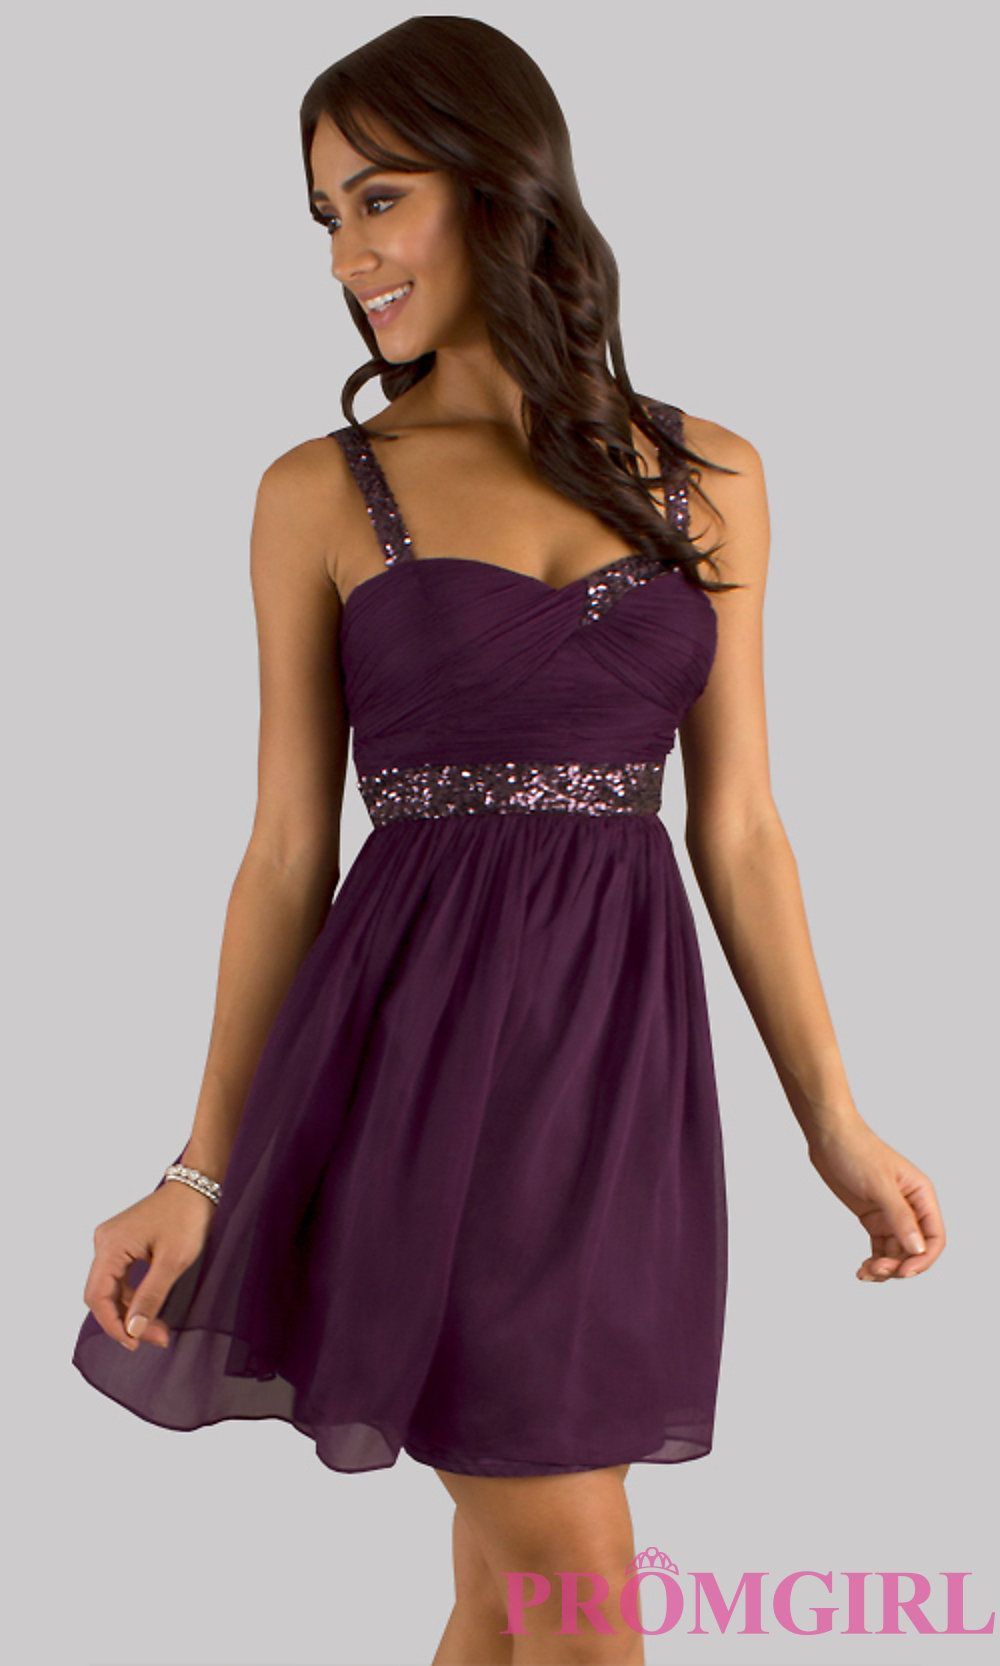 Short party dress sleeveless purple semi formal dress promgirl